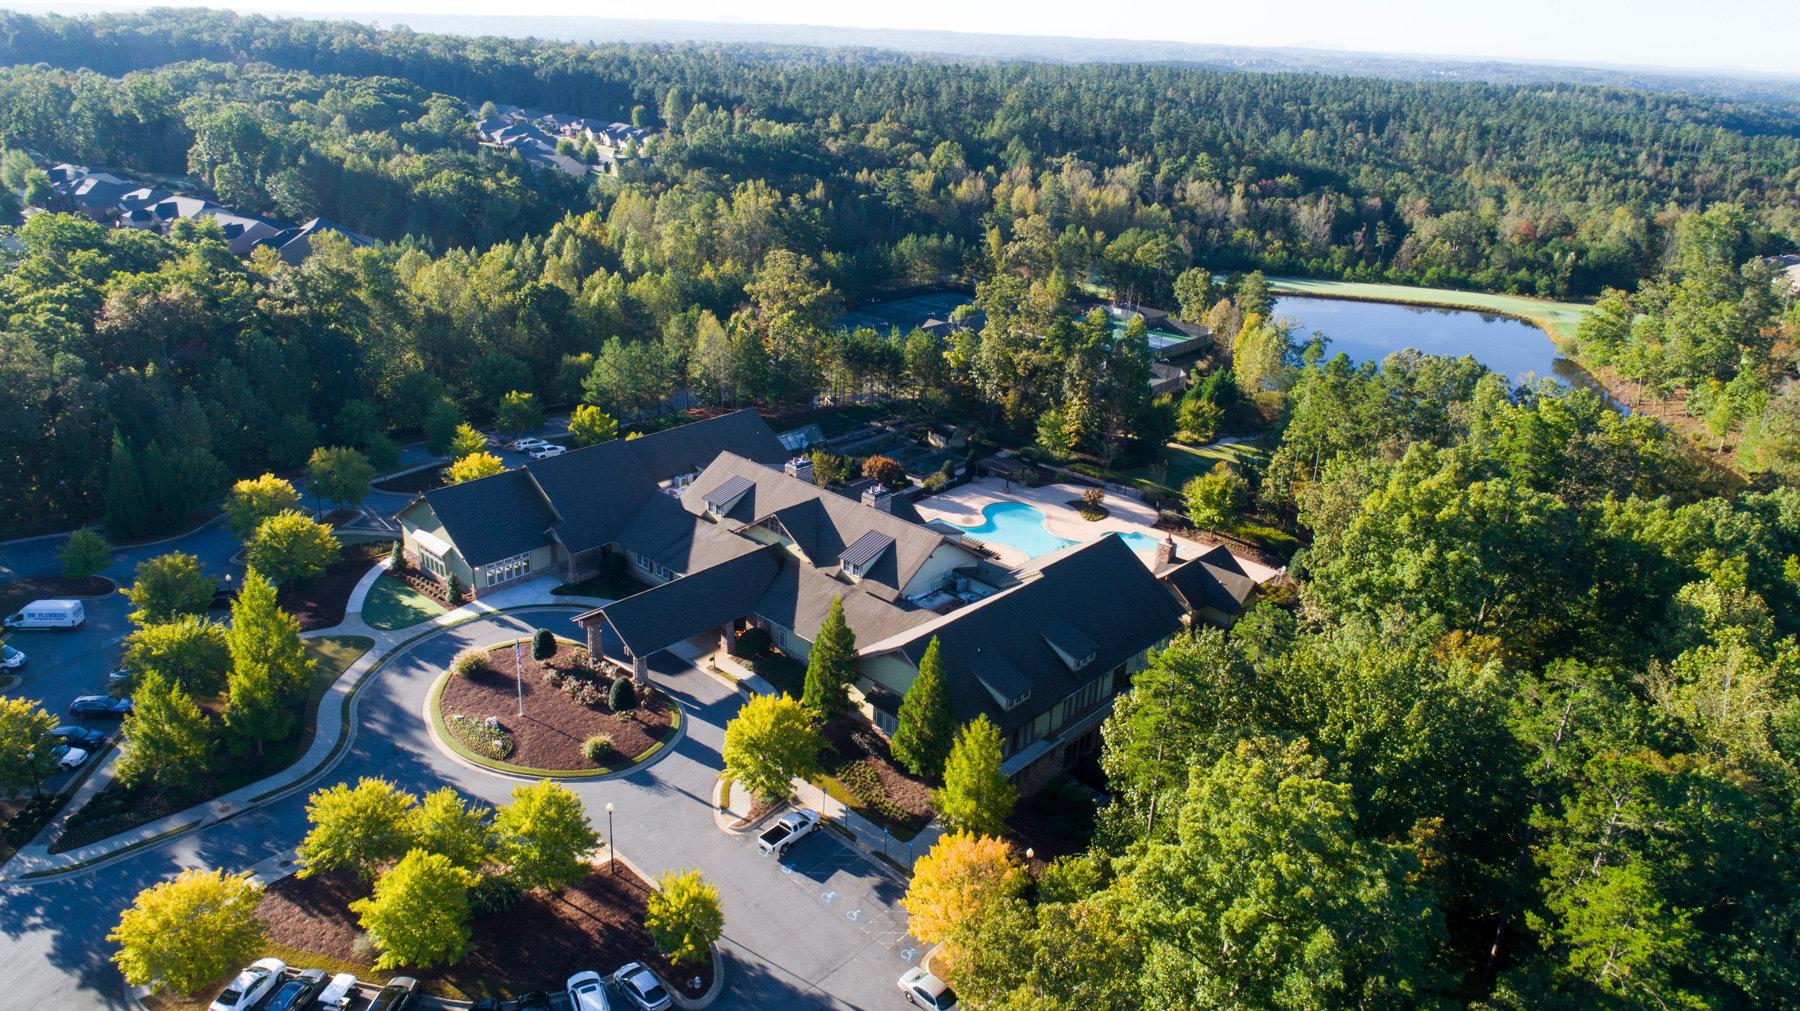 Soleil Laurel Canyon Canton Ga Active Adult 55 Homes For Sale